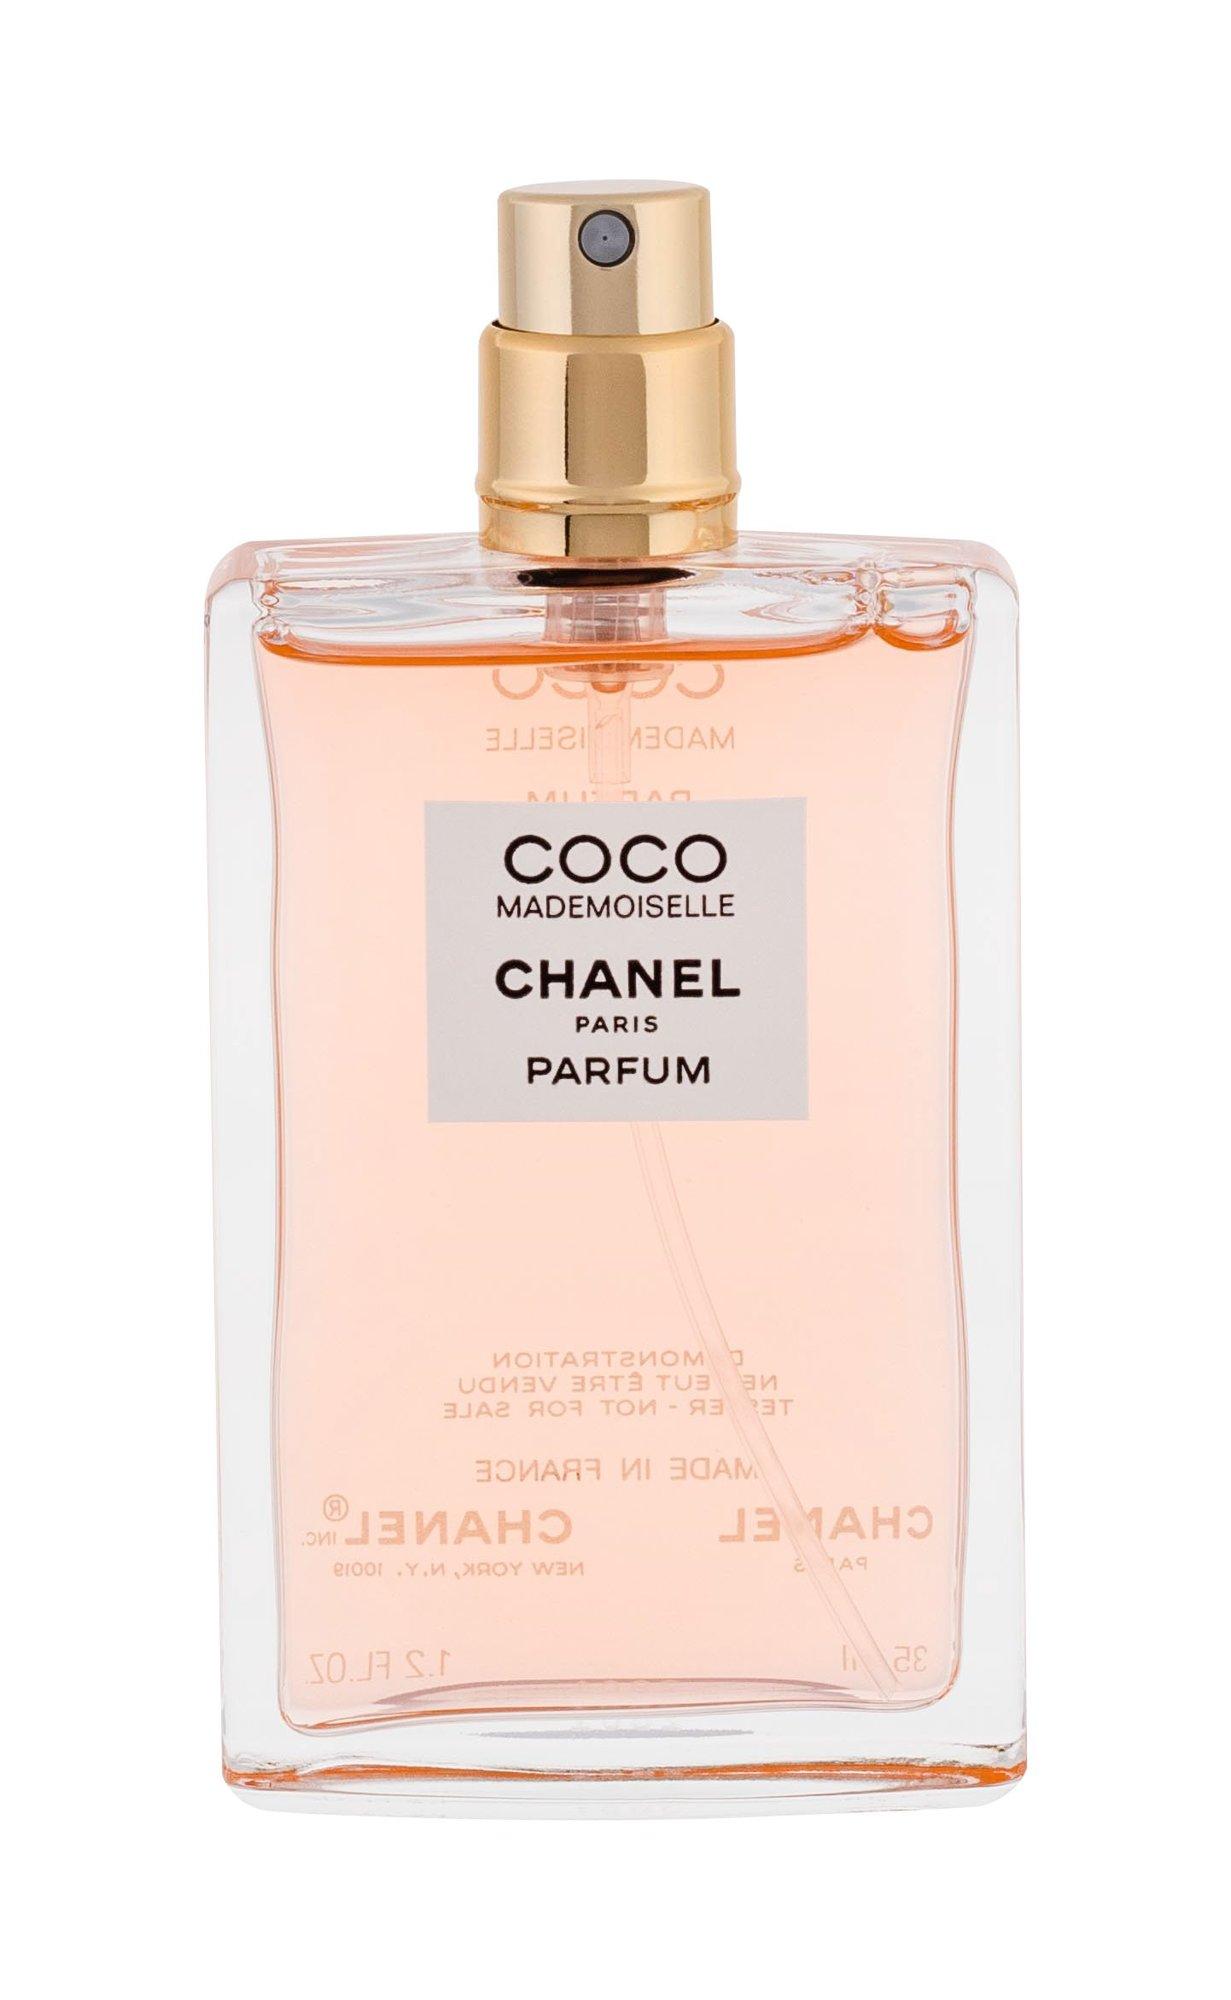 Chanel Coco Mademoiselle Parfem 35ml